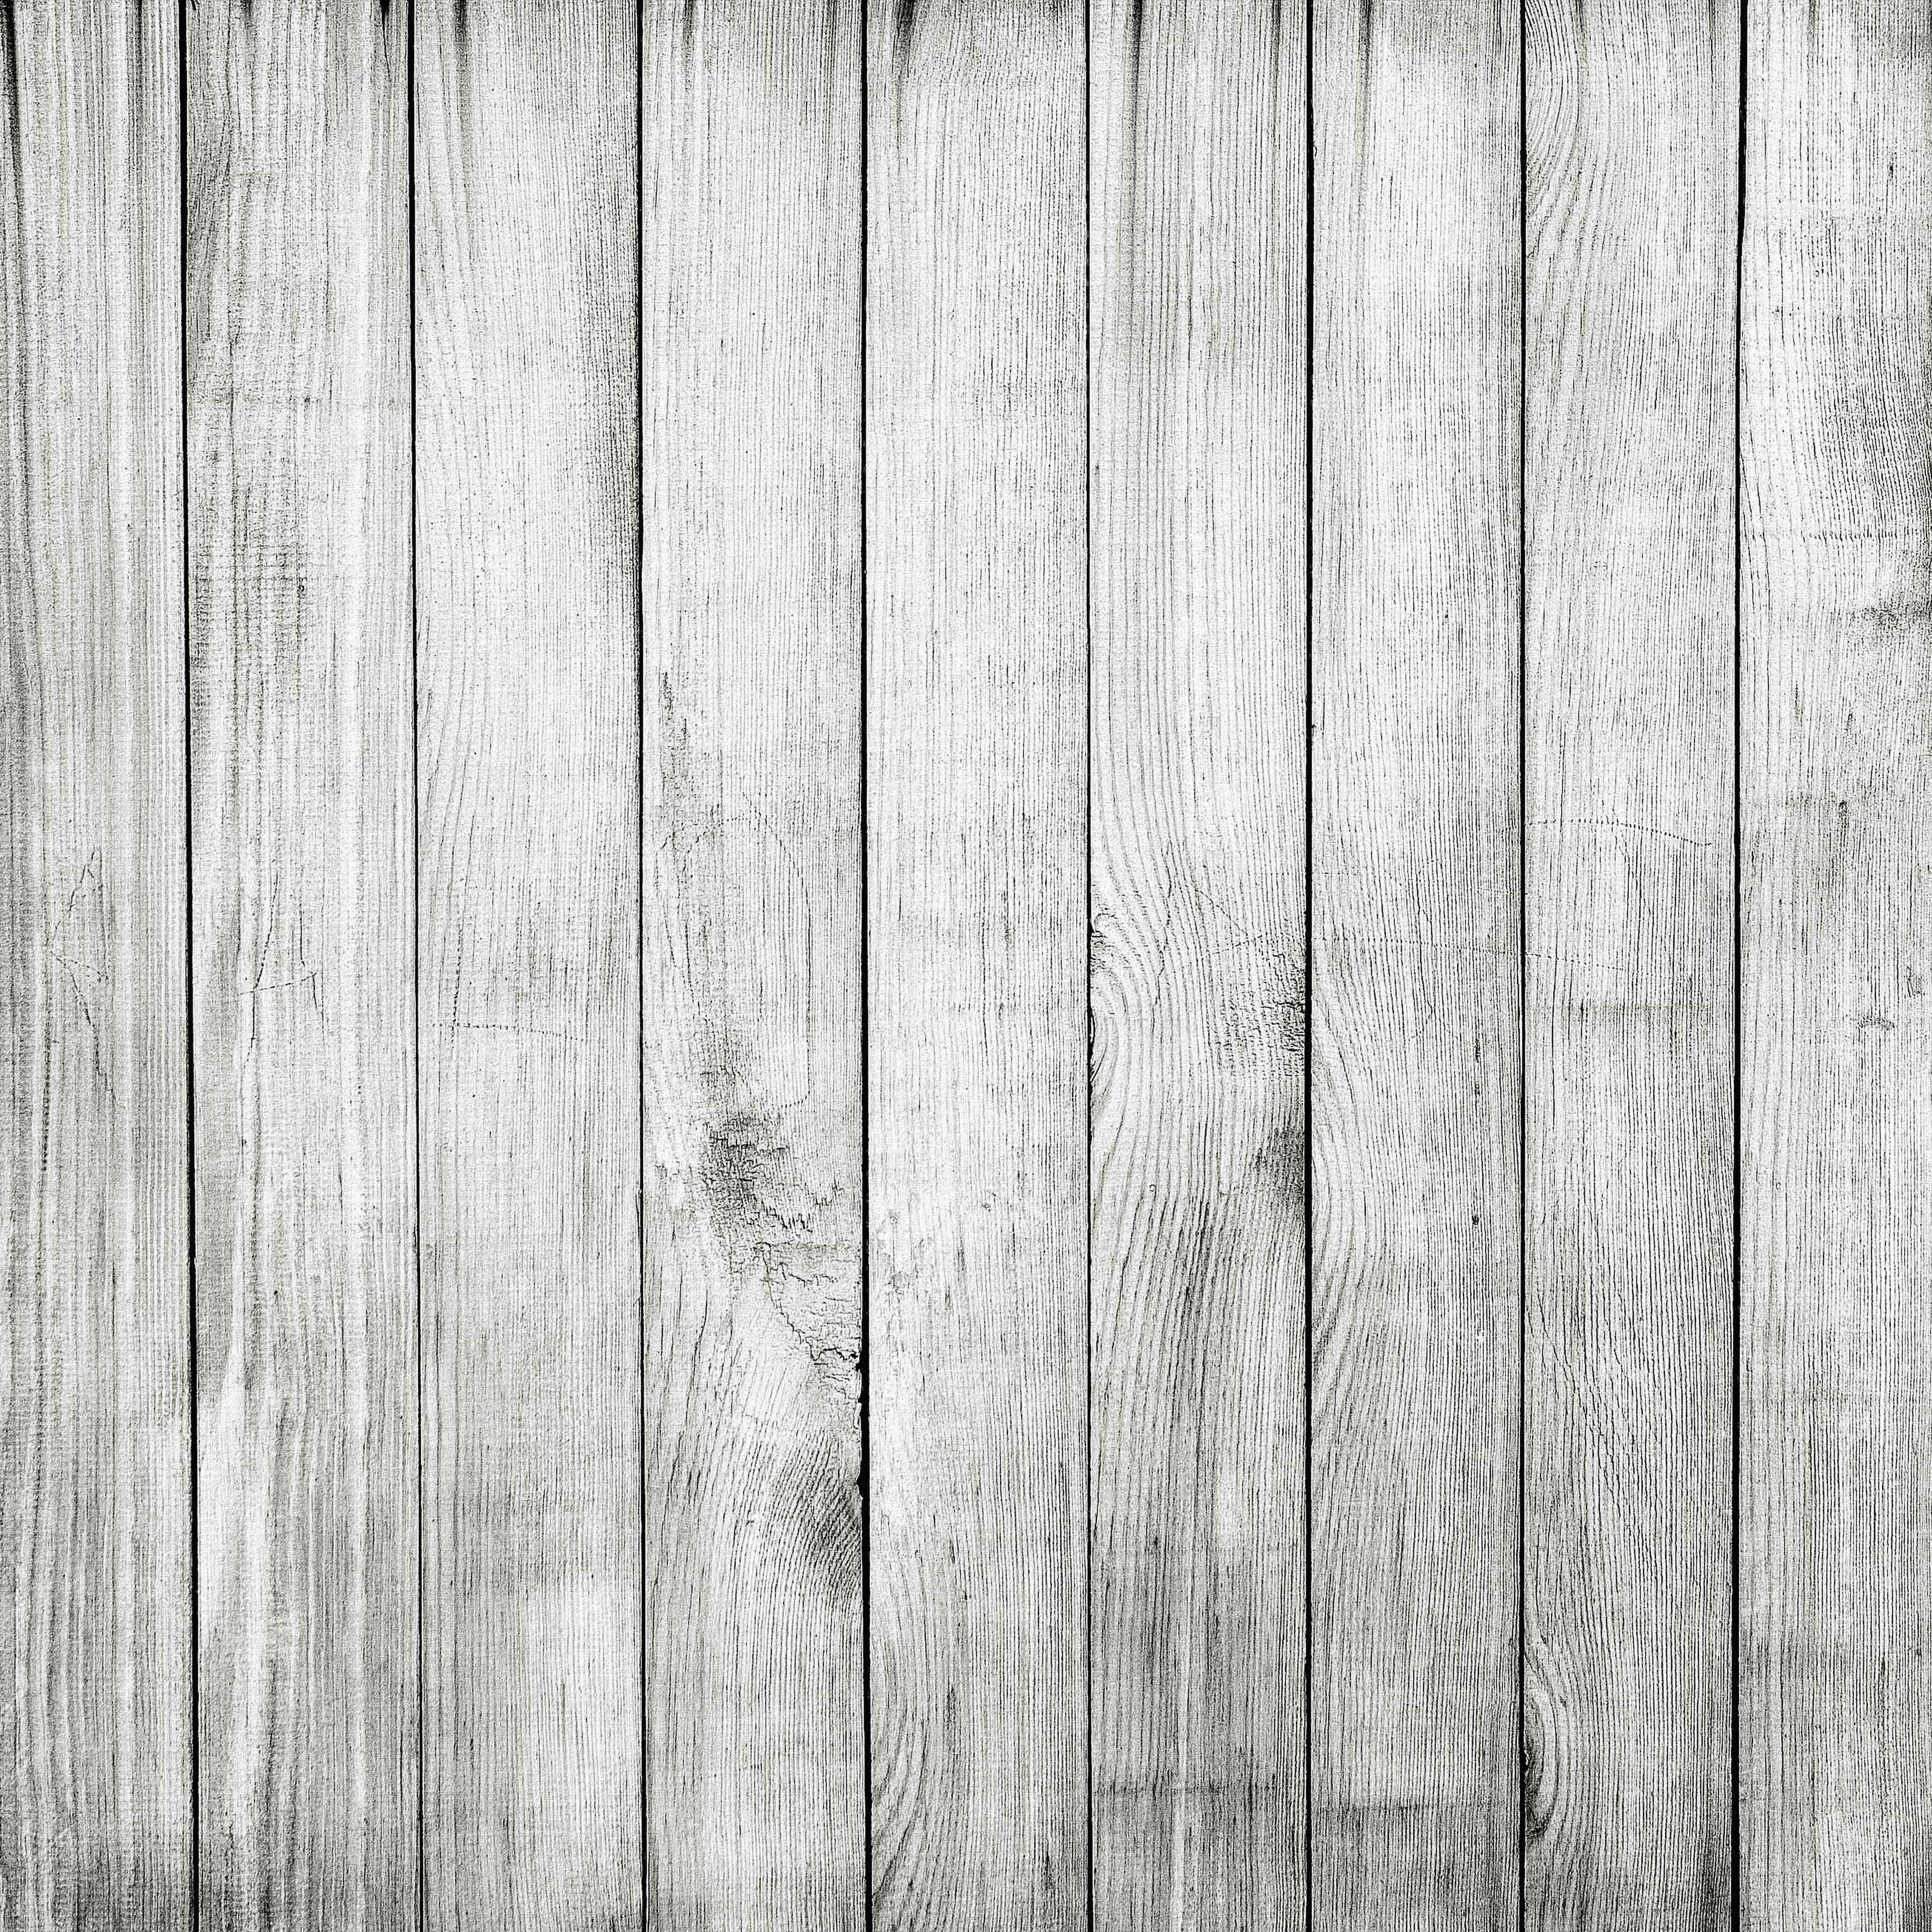 White Wood Texture Free